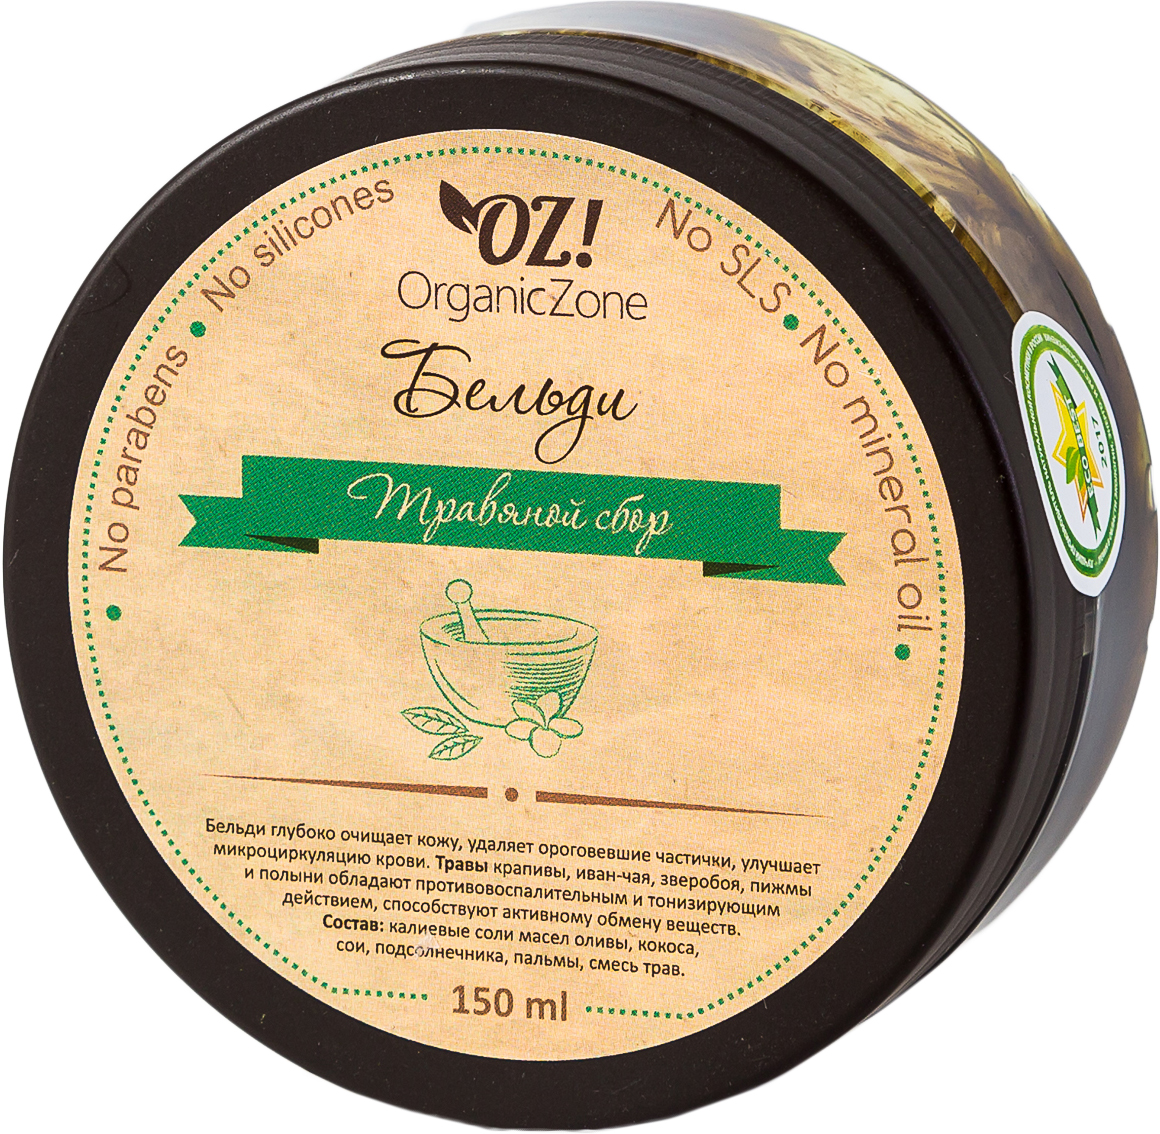 OrganicZone Бельди Травяной сбор, 150 мл дезодоранты organiczone дезодорант